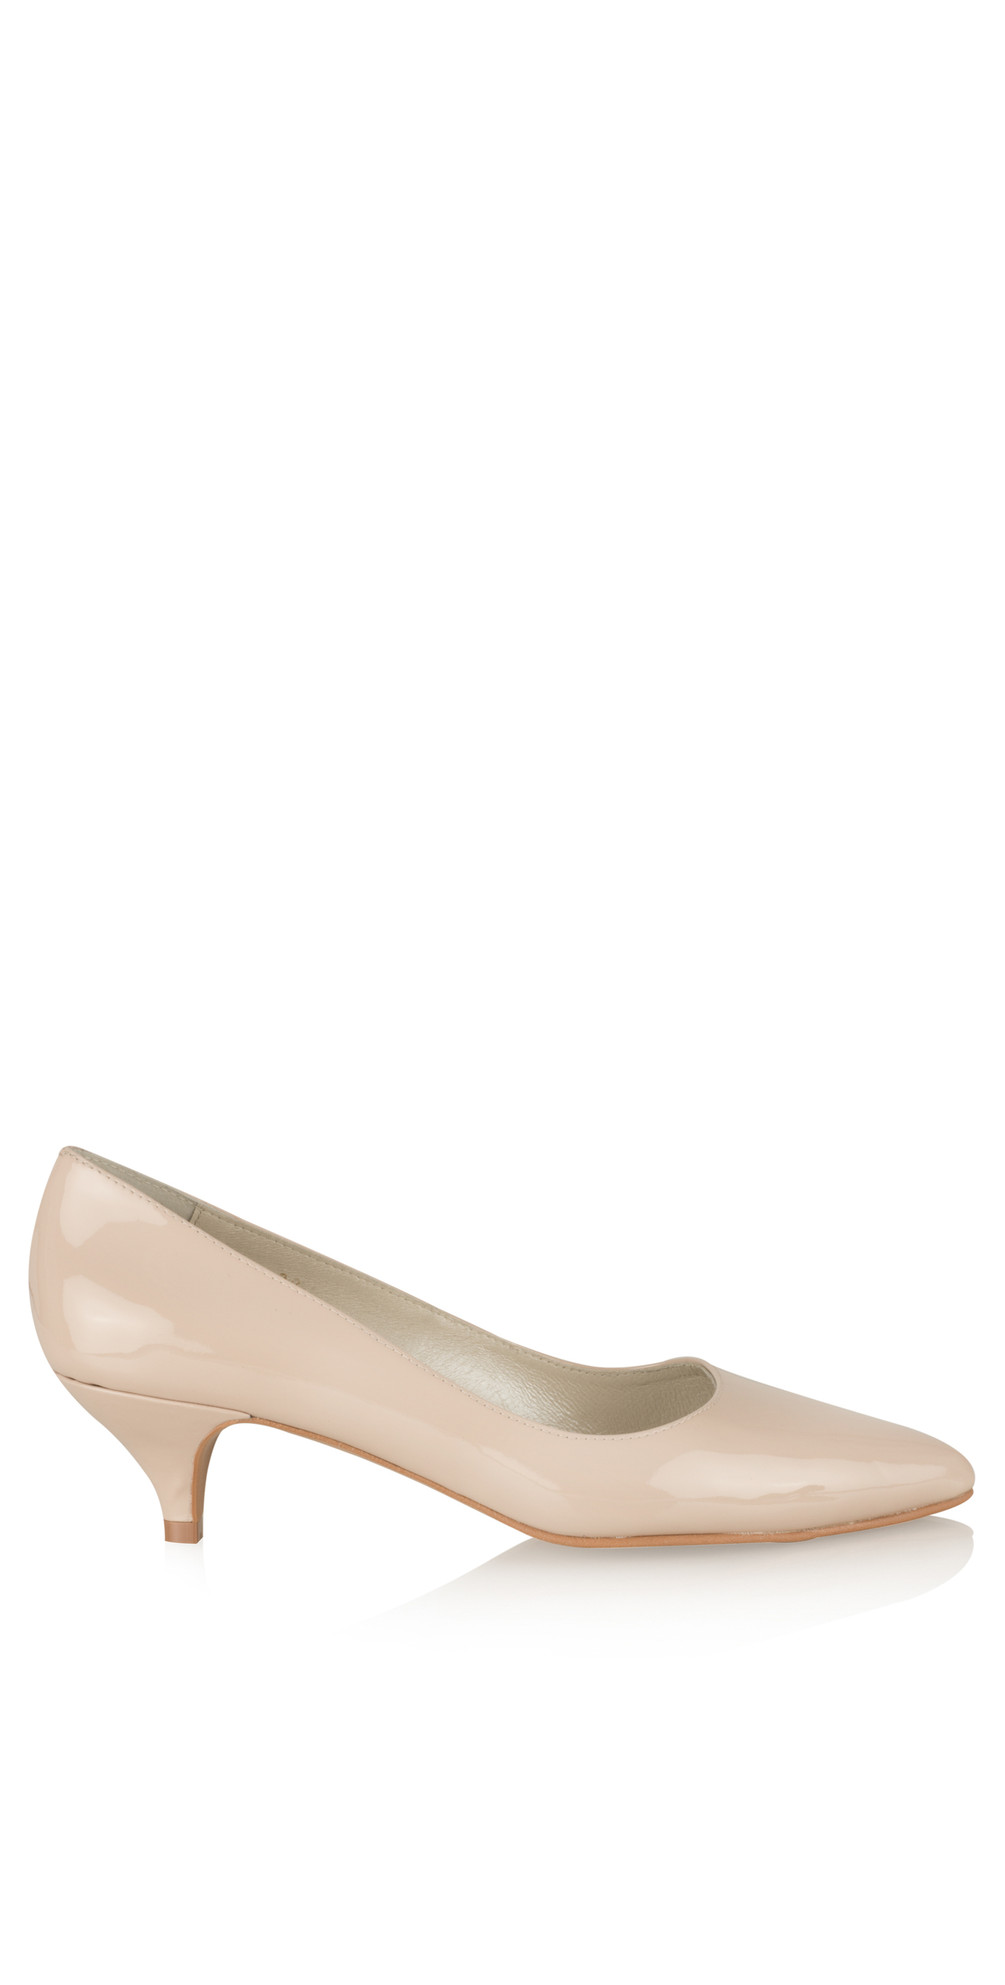 df3763f788c Nude Daila Patent Kitten Heel